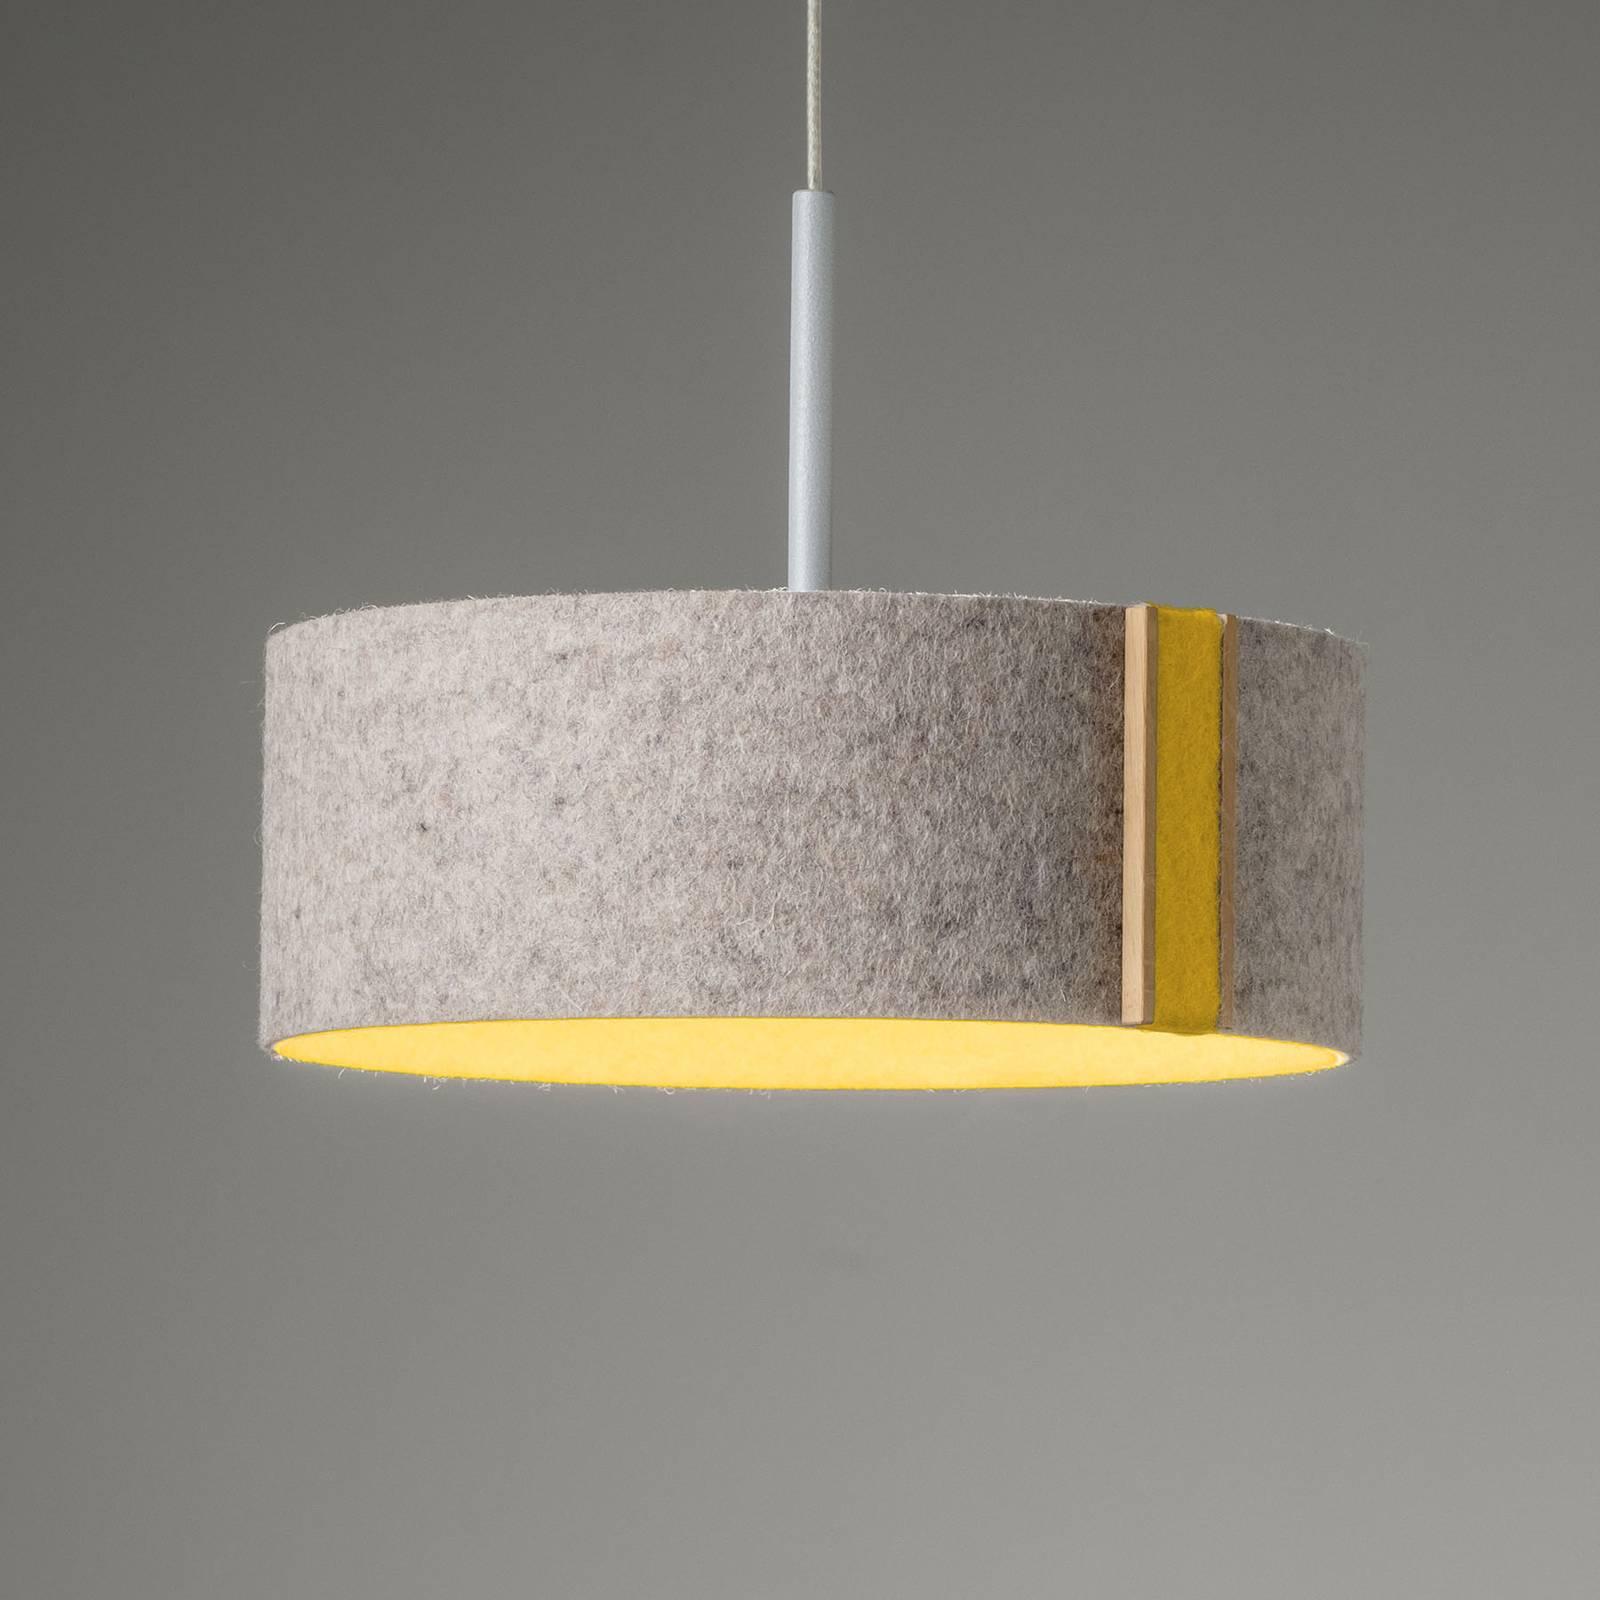 LED-riippuvalaisin LARAfelt S, Ø20cm, harmaa/curry